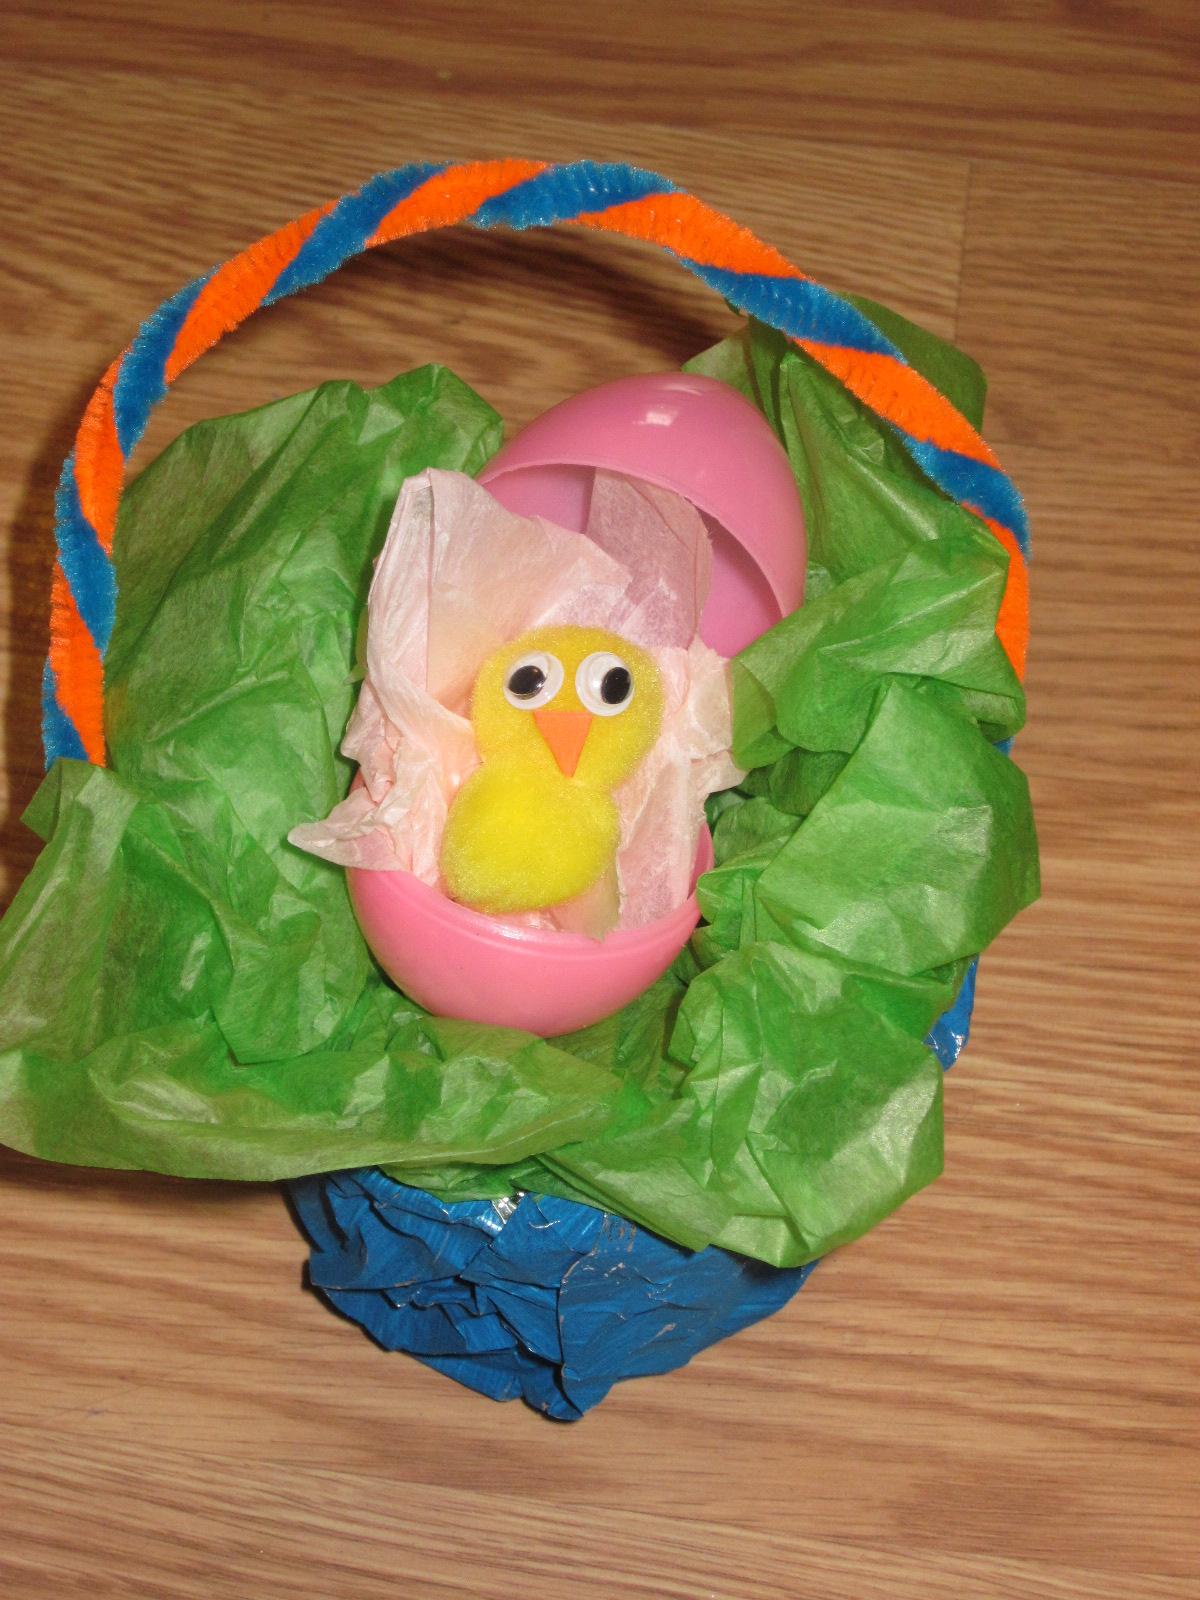 Preschool Art Easter Basket : Easter crafts for preschool kids cafemom